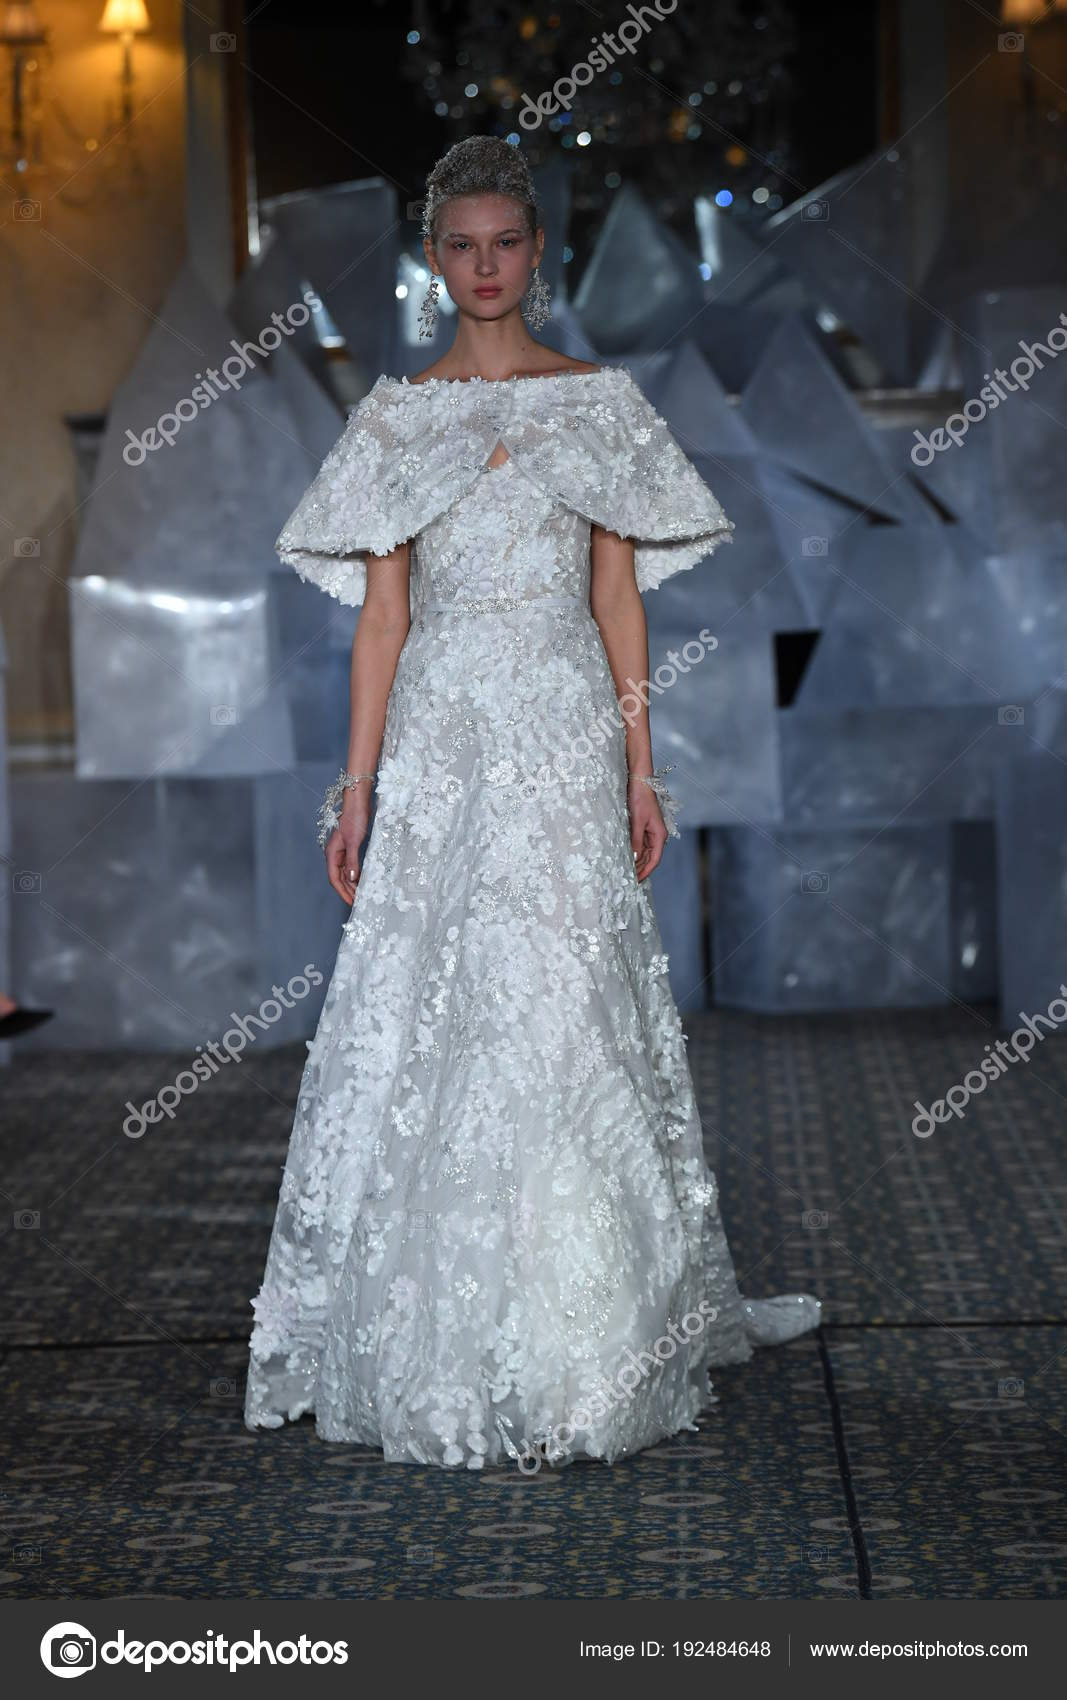 Nueva York Abril Modelo Camina Pista Durante Moda Novia Mira — Foto ...